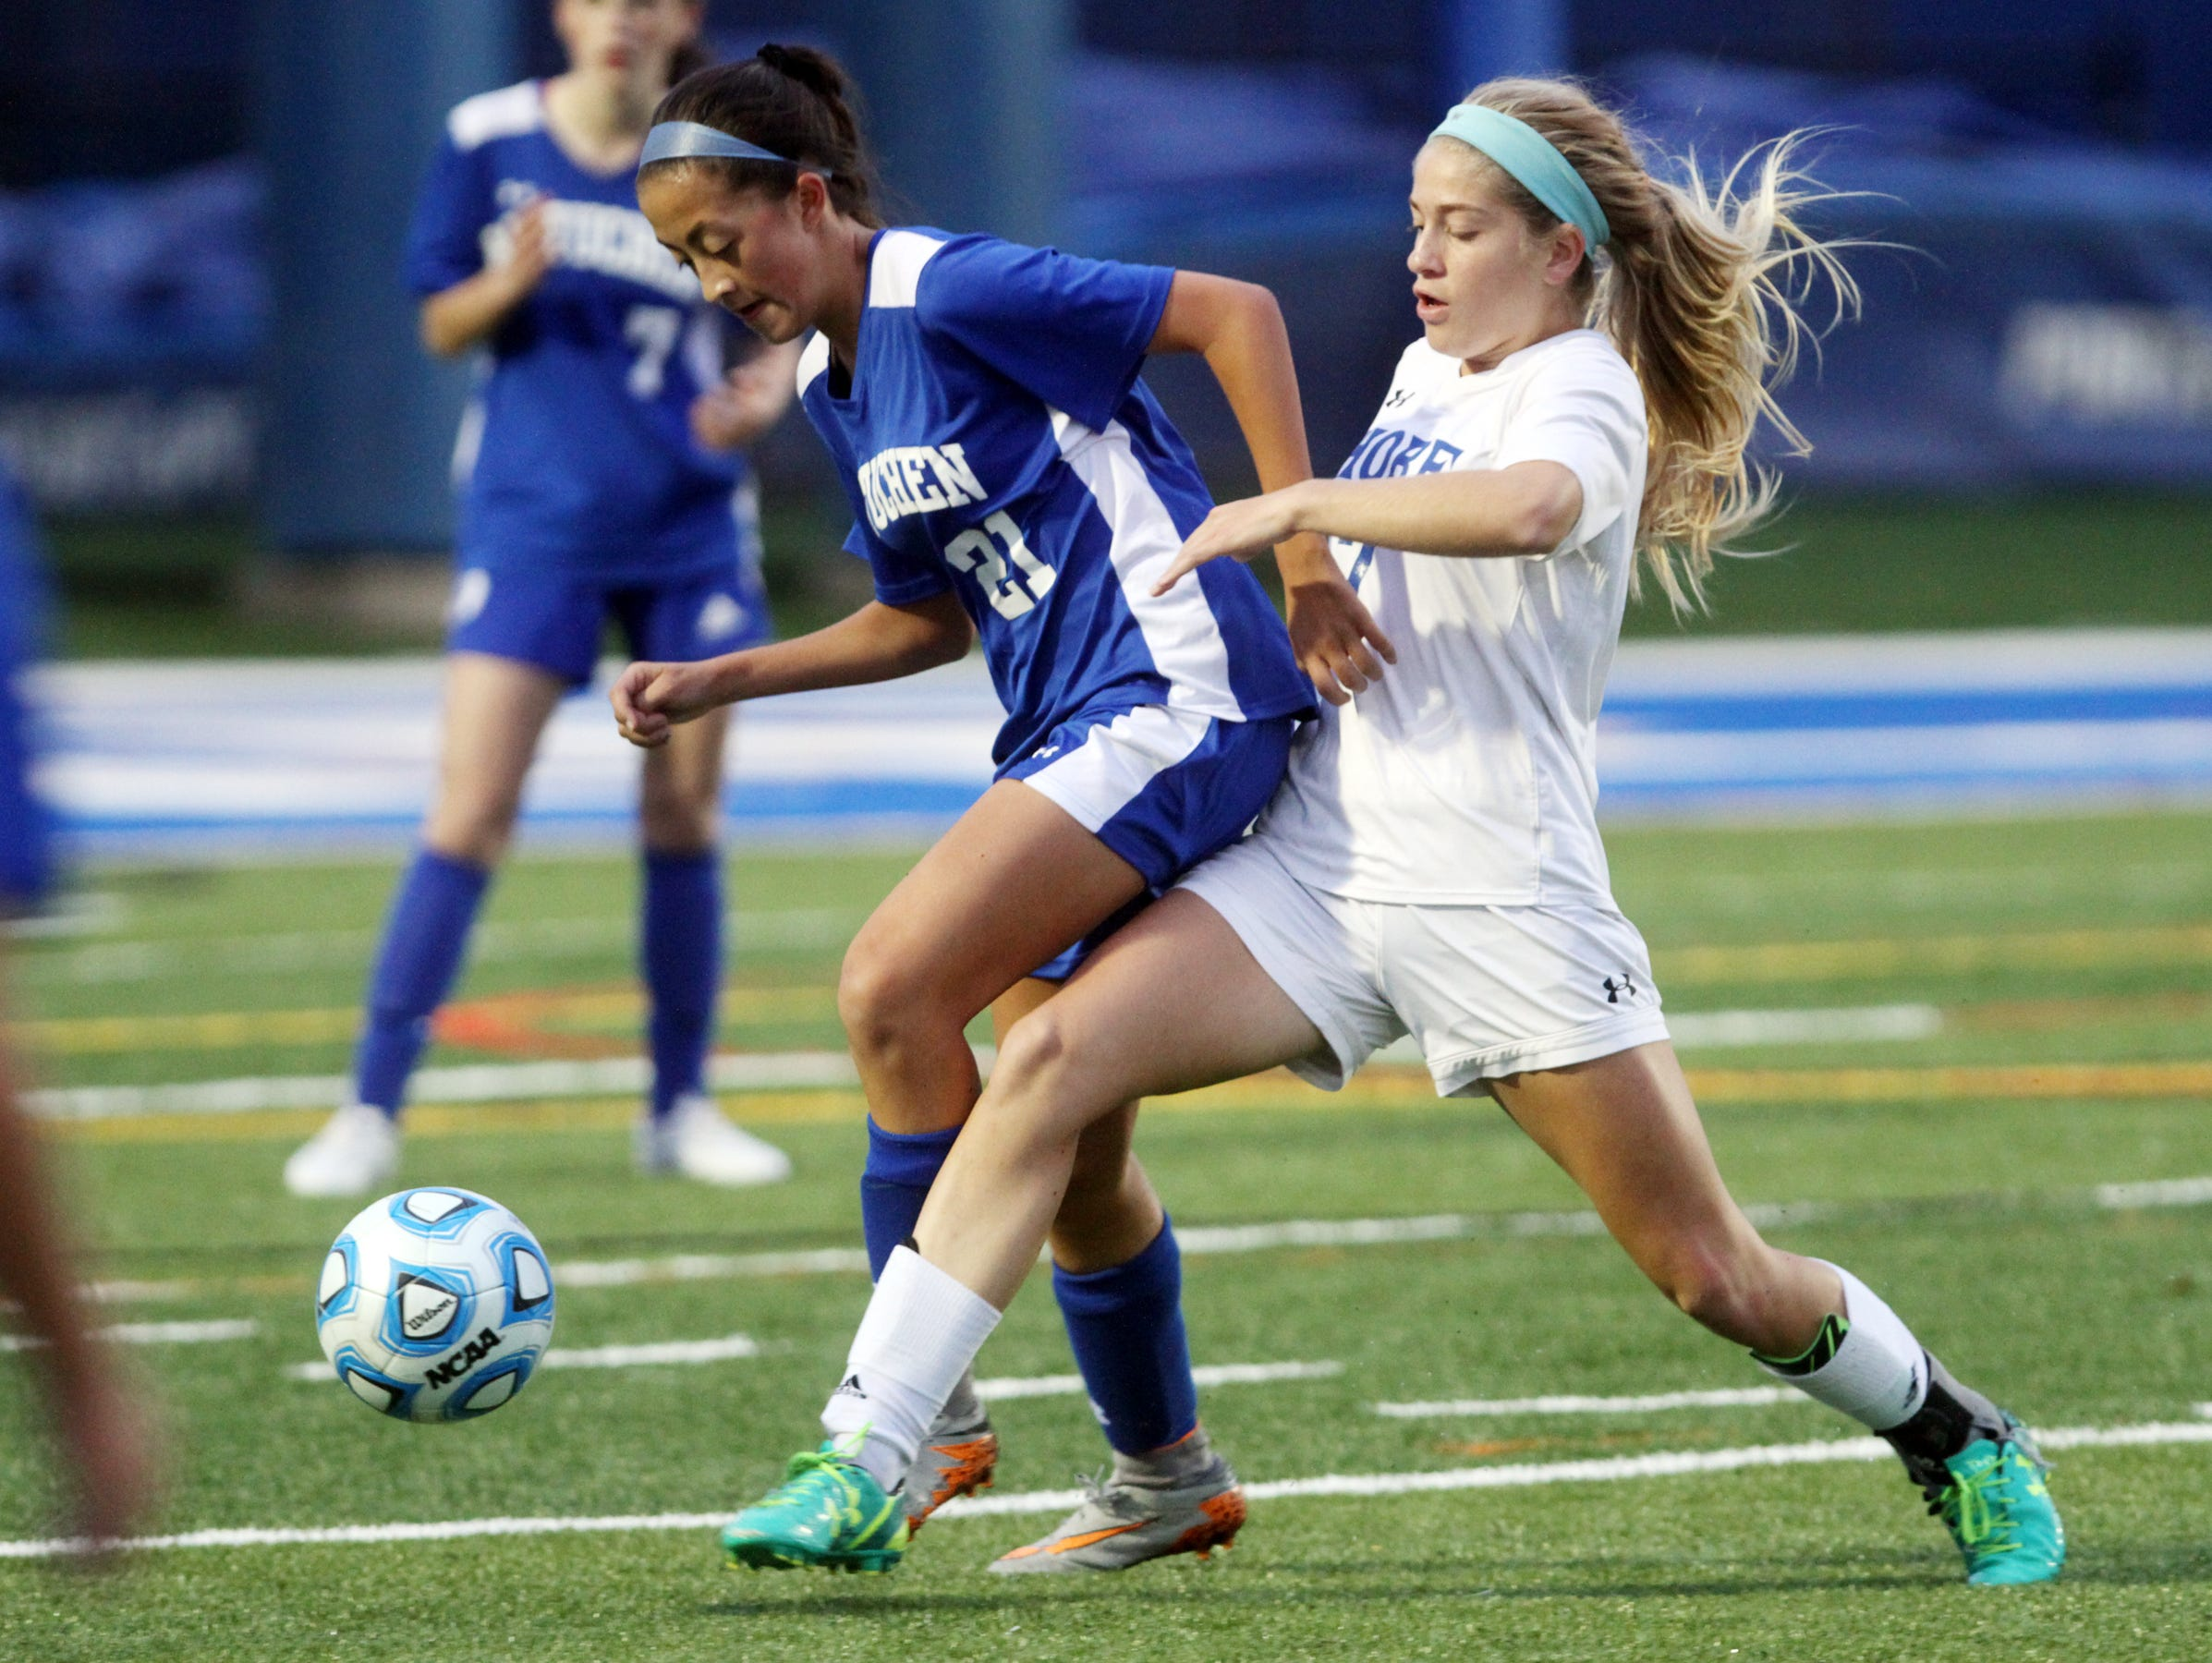 Metuchen's Mya Stolarski battles for possession with Shore Regional's Frankie McDonough during Central Group I girls soccer sectional final, Thursday, November 12, 2015, in West Long Branch.